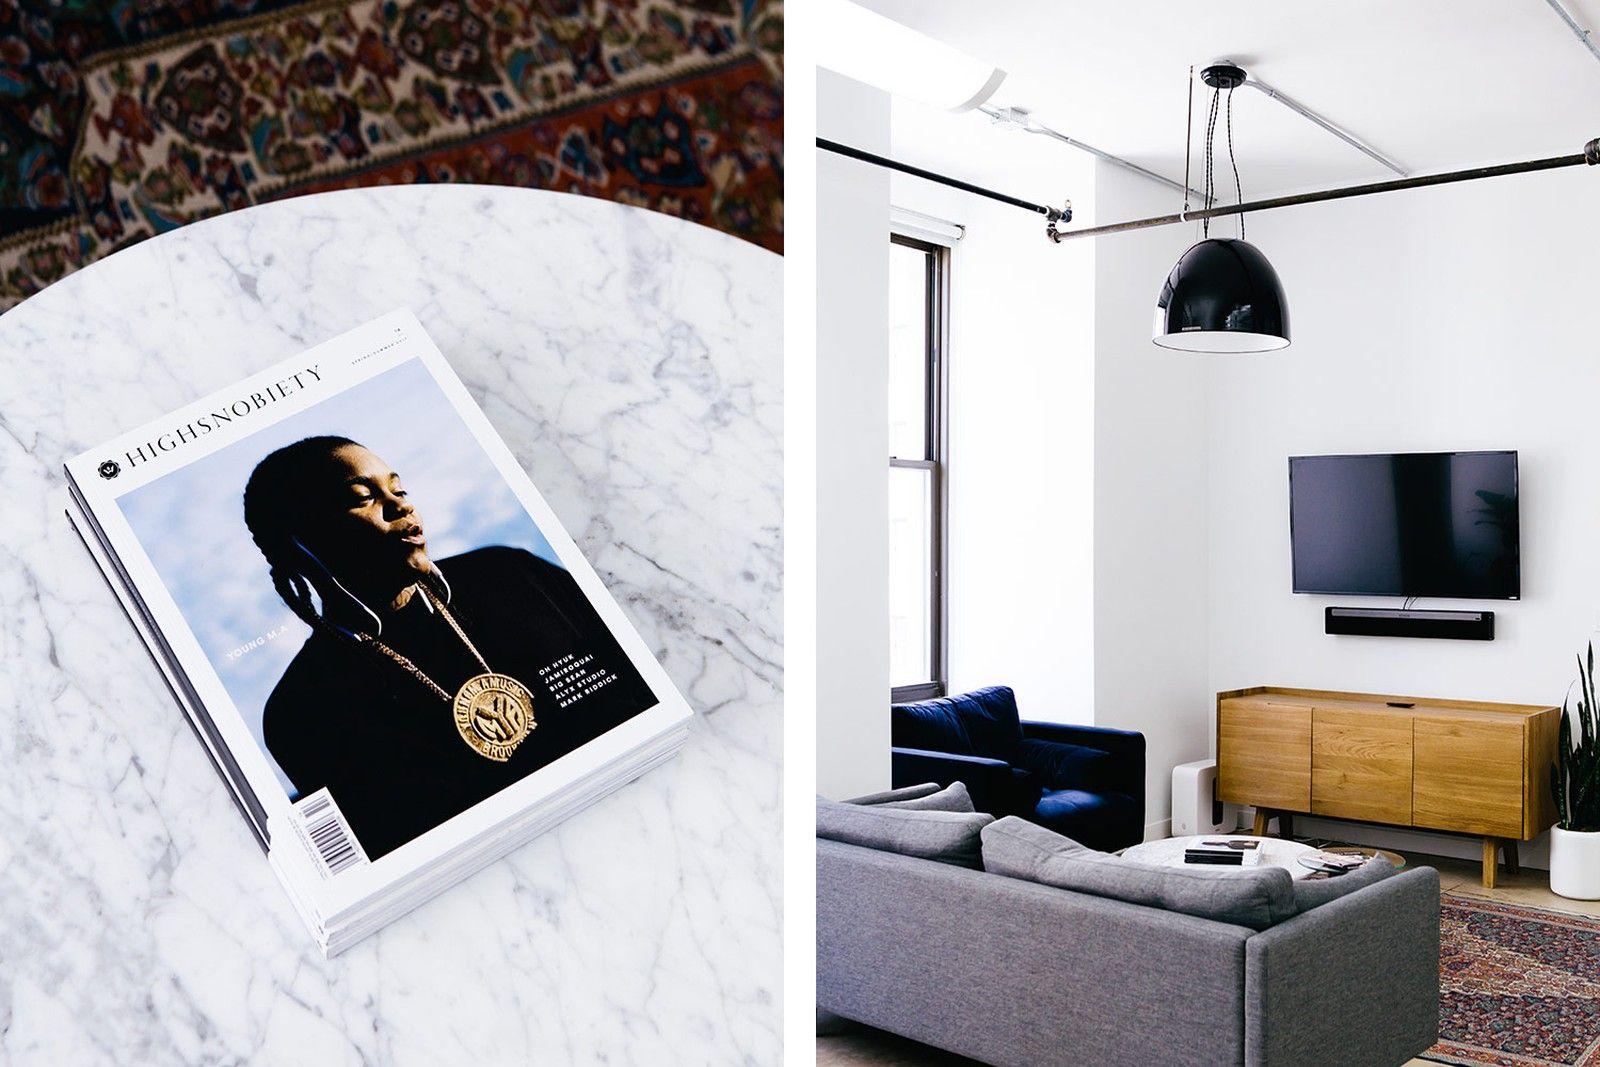 Highsnobiety-New-York-Office-Design-19